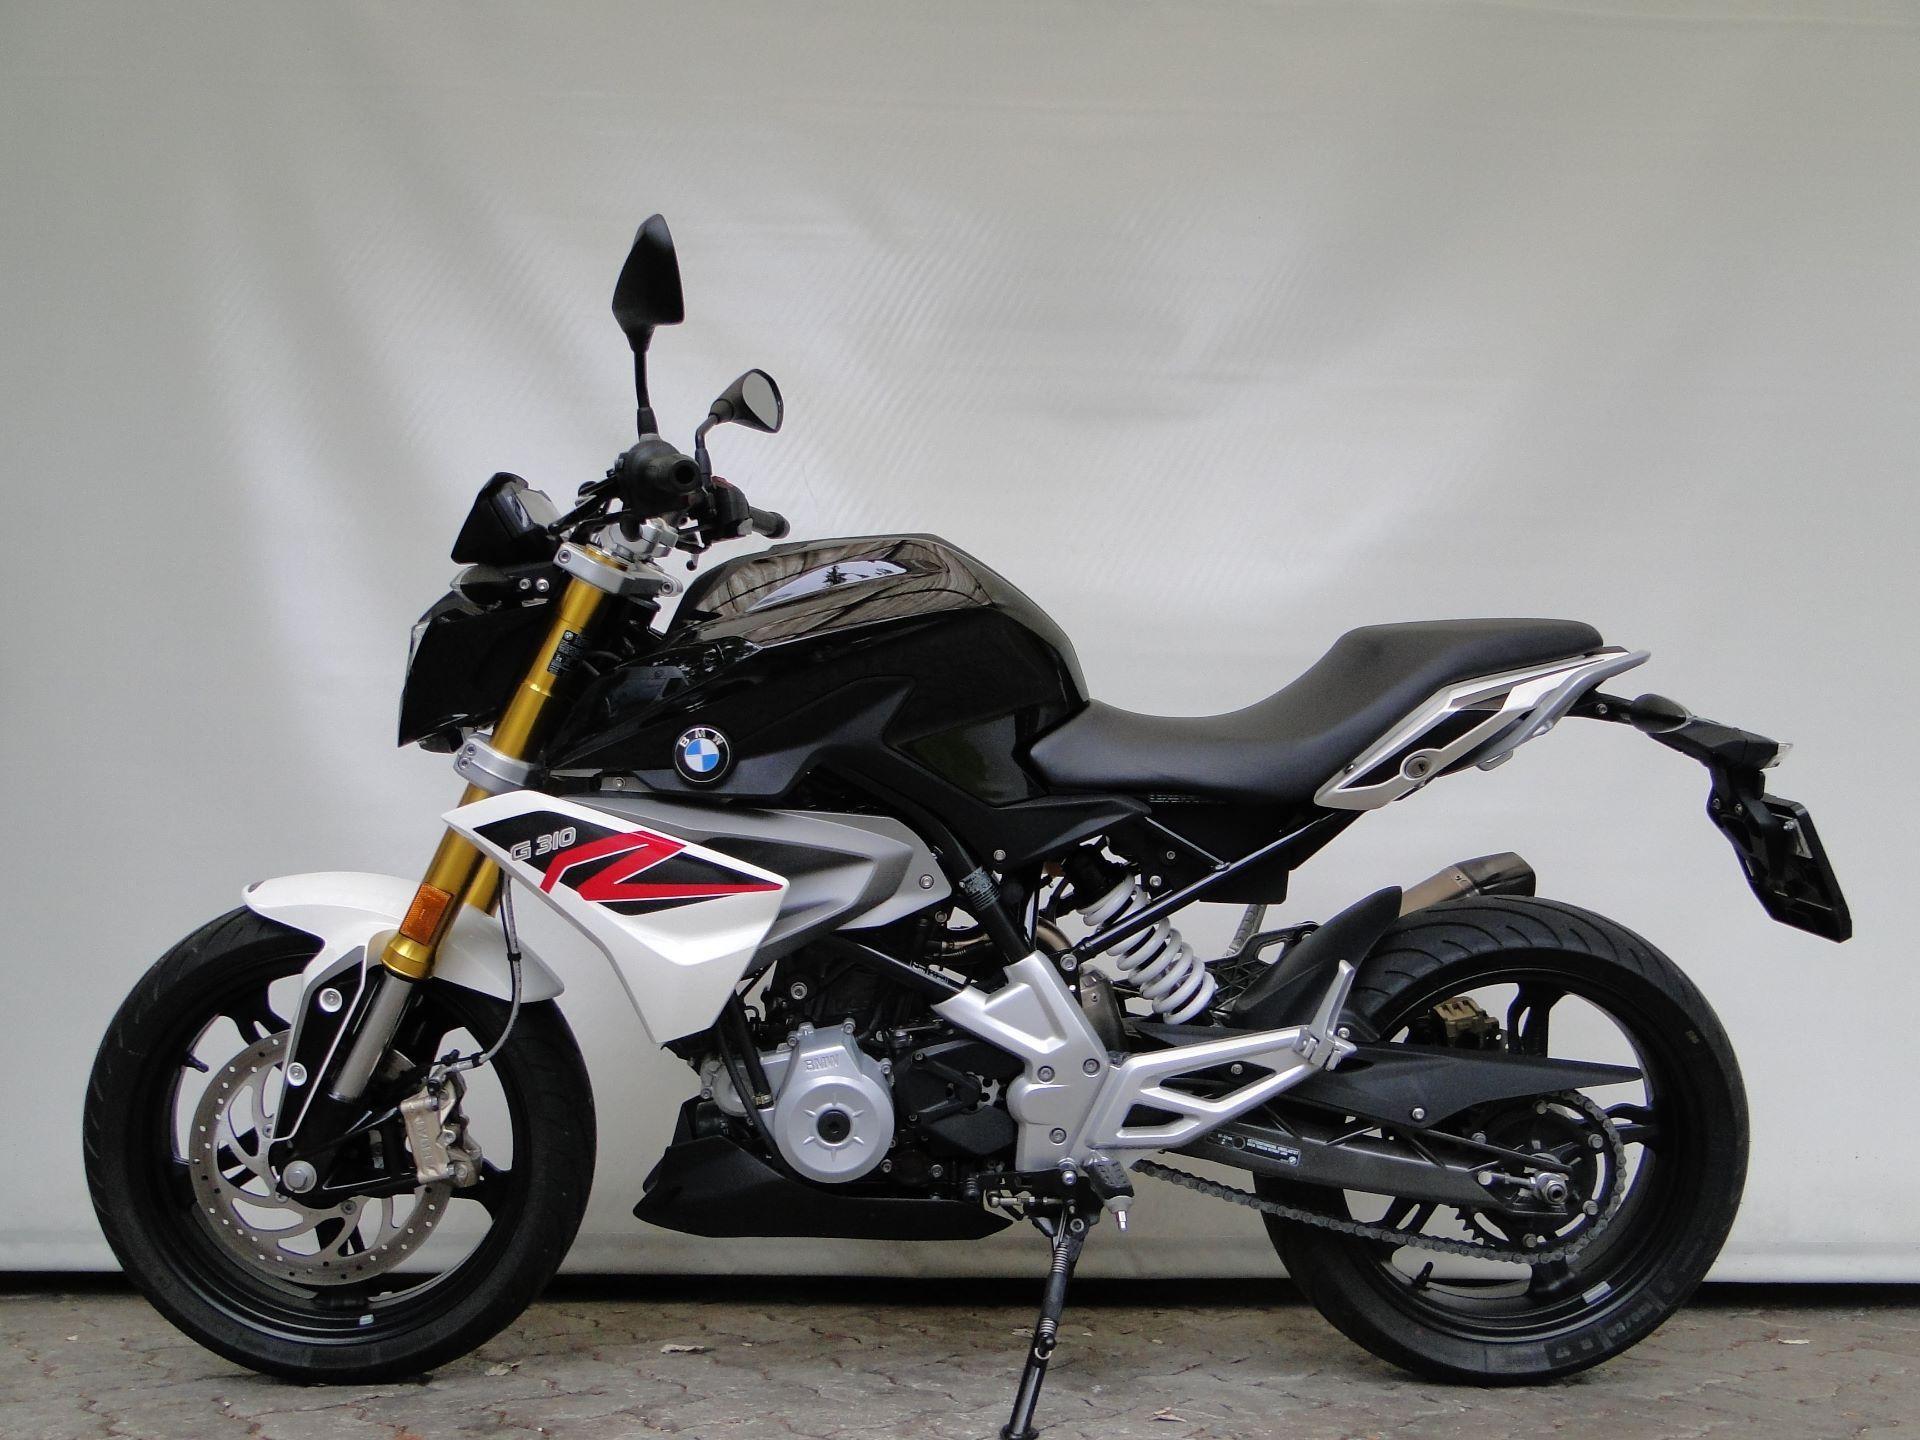 motorrad occasion kaufen bmw g 310 r abs neu aktion hobi moto ag winterthur. Black Bedroom Furniture Sets. Home Design Ideas